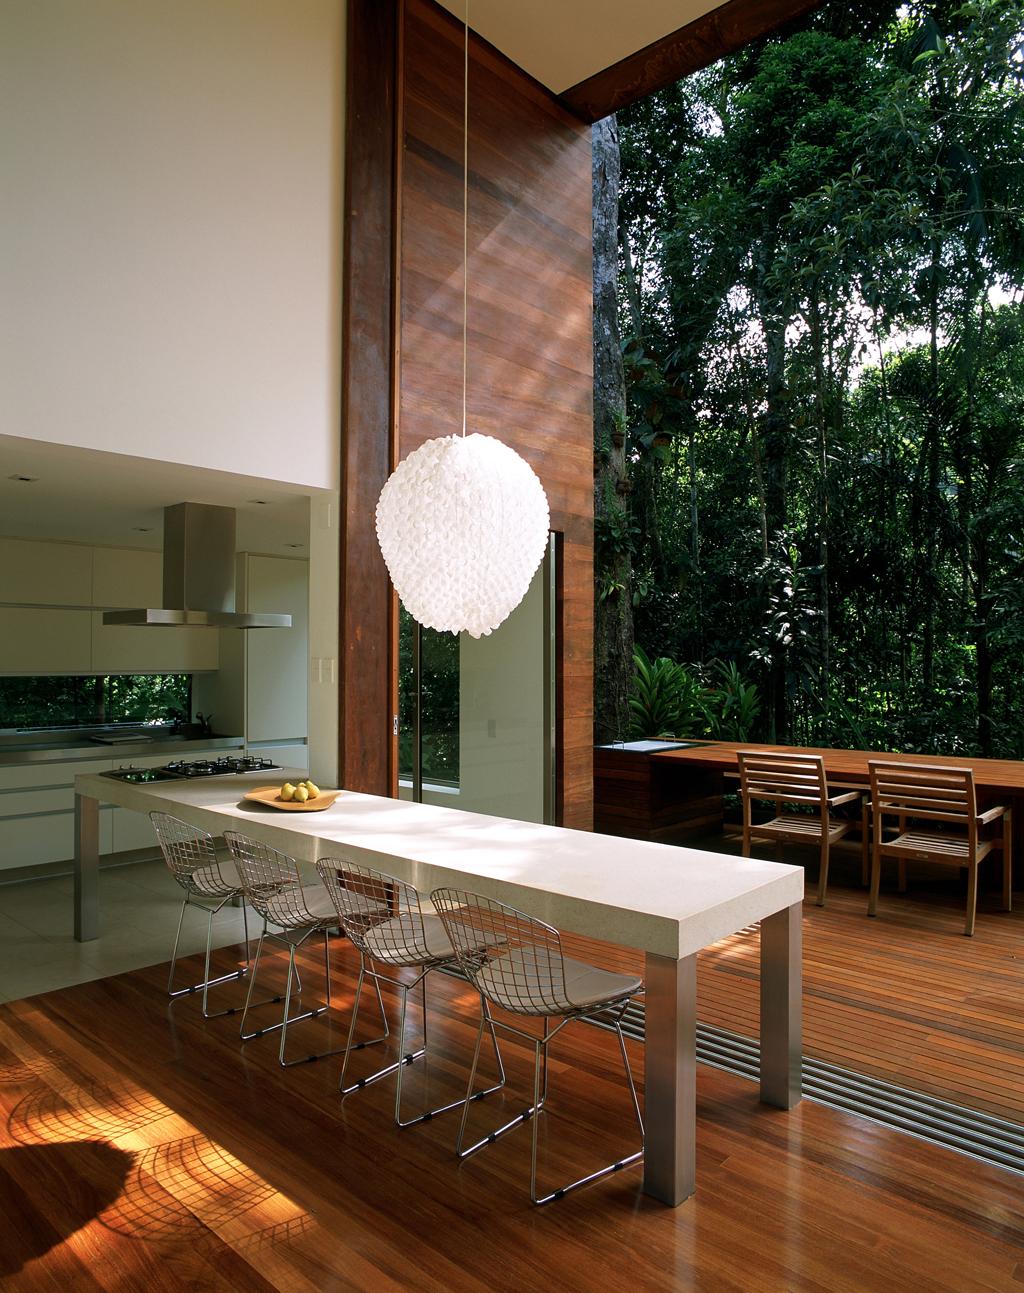 Studio Arthur Casas House in Iporanga - flodeau.com 11